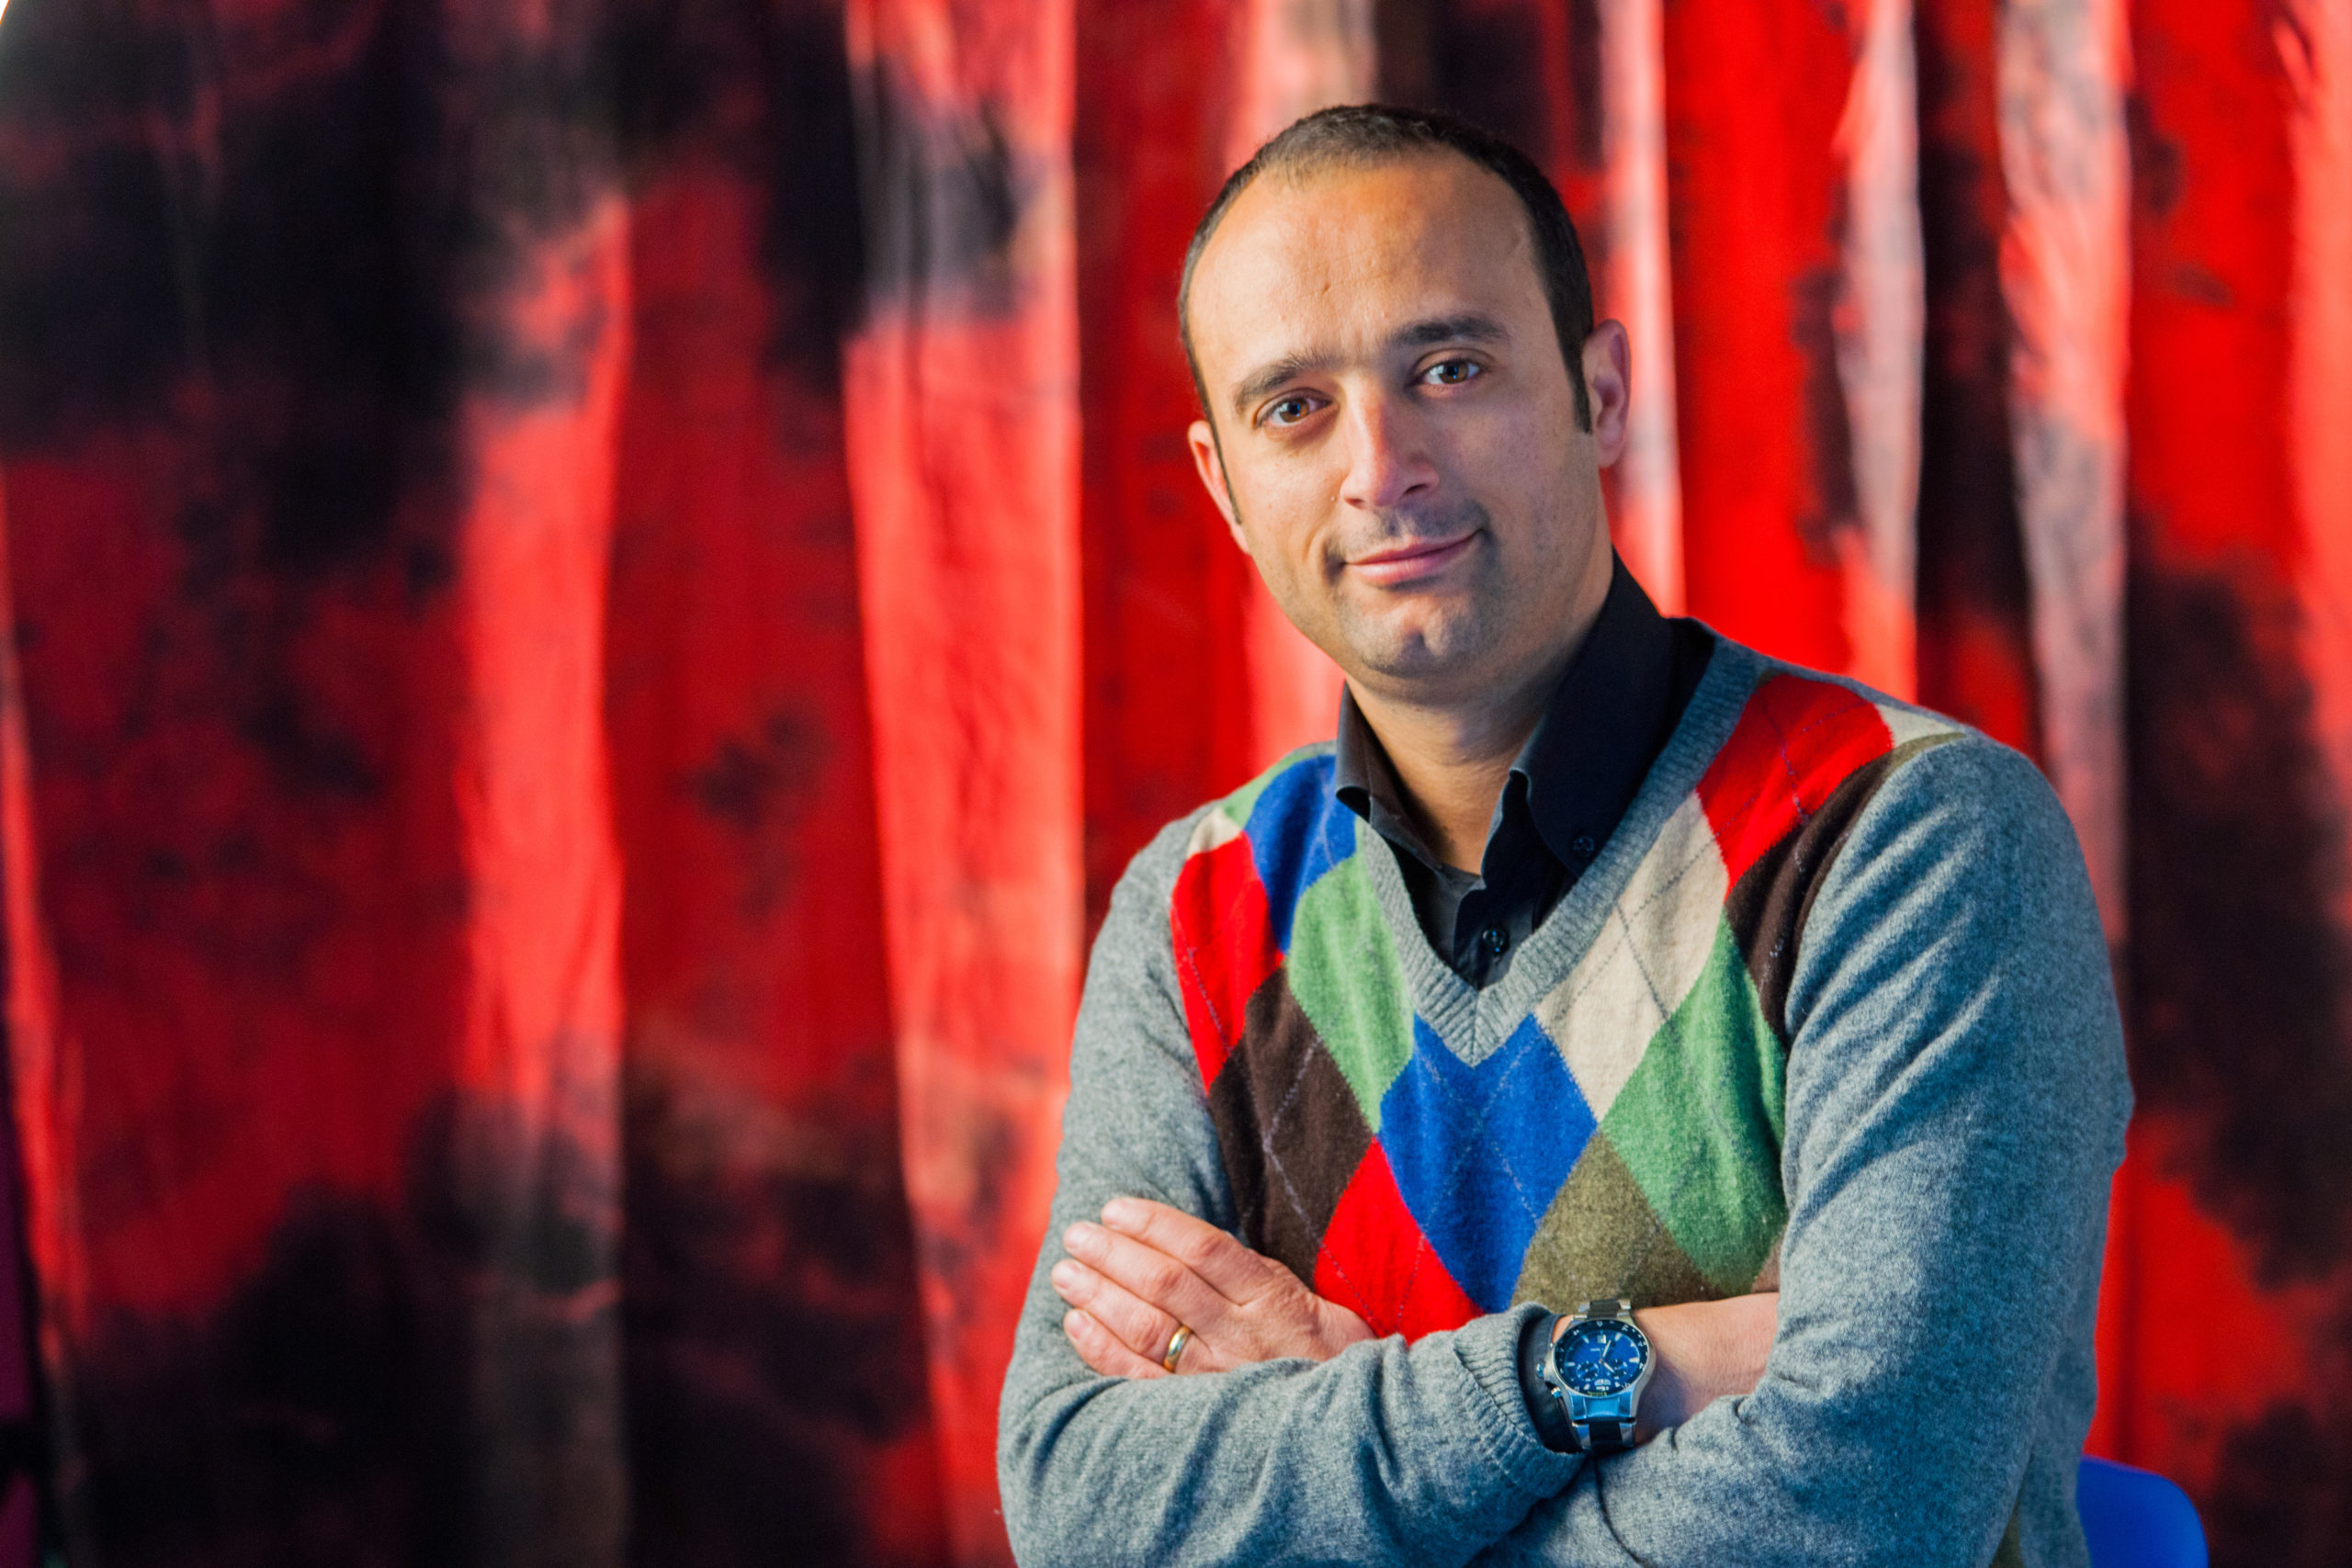 Emiliano Bonaffini